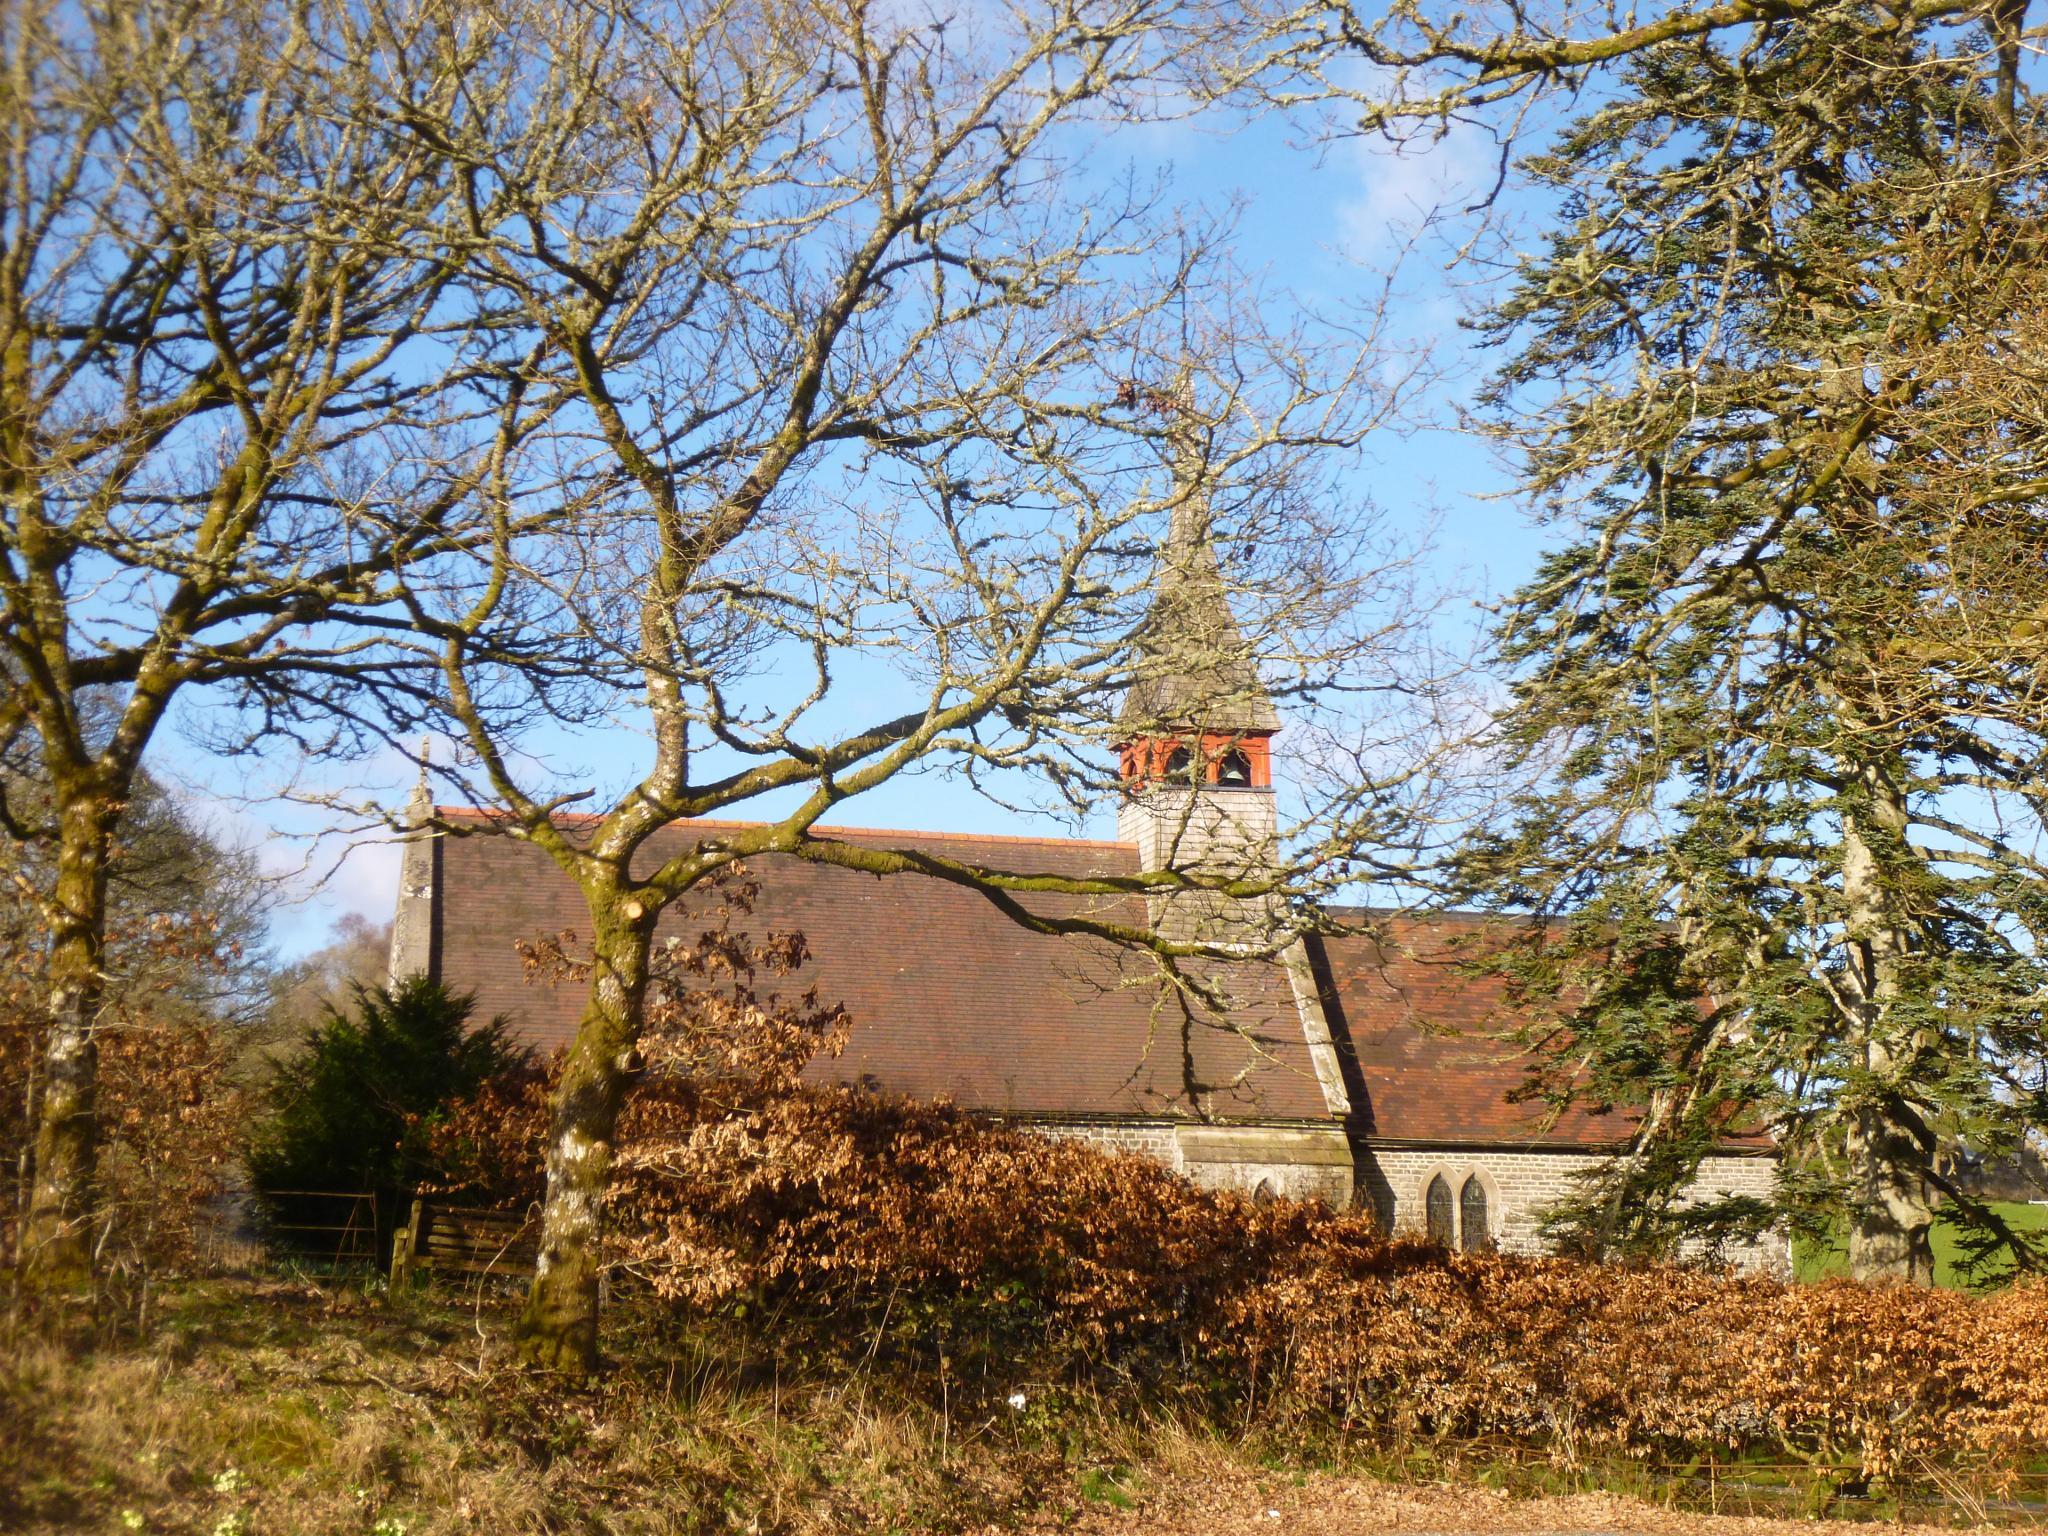 church by chris.adams.3557